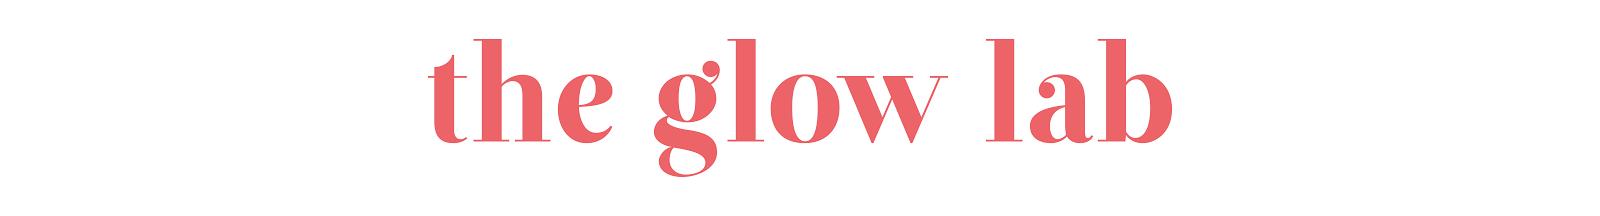 the glow lab